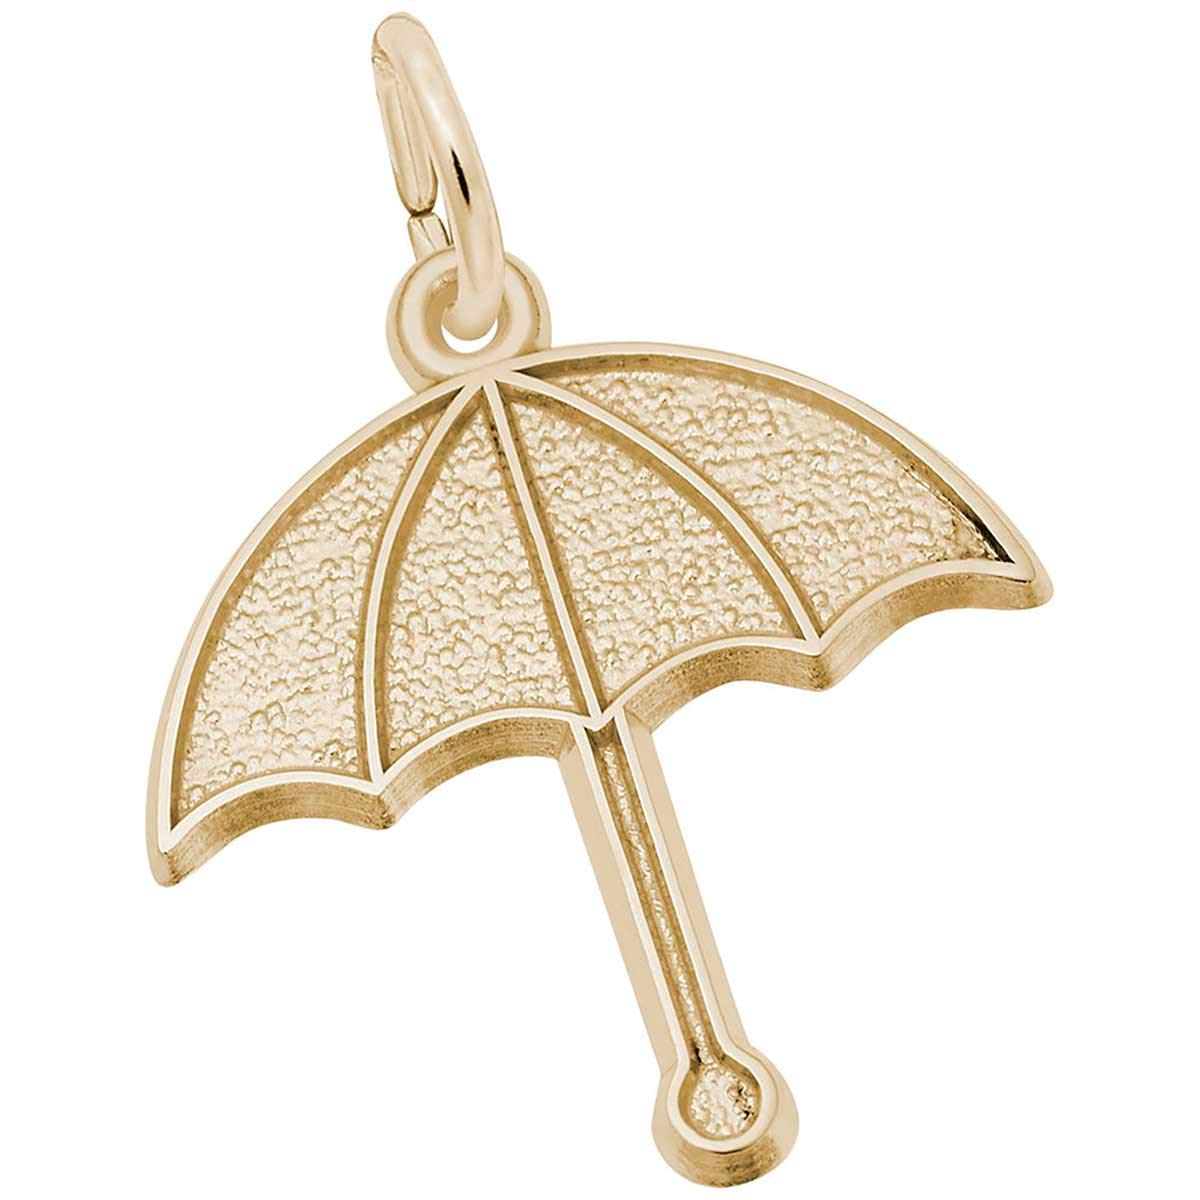 Rembrandt Charms Umbrella Charm, 10K Yellow Gold